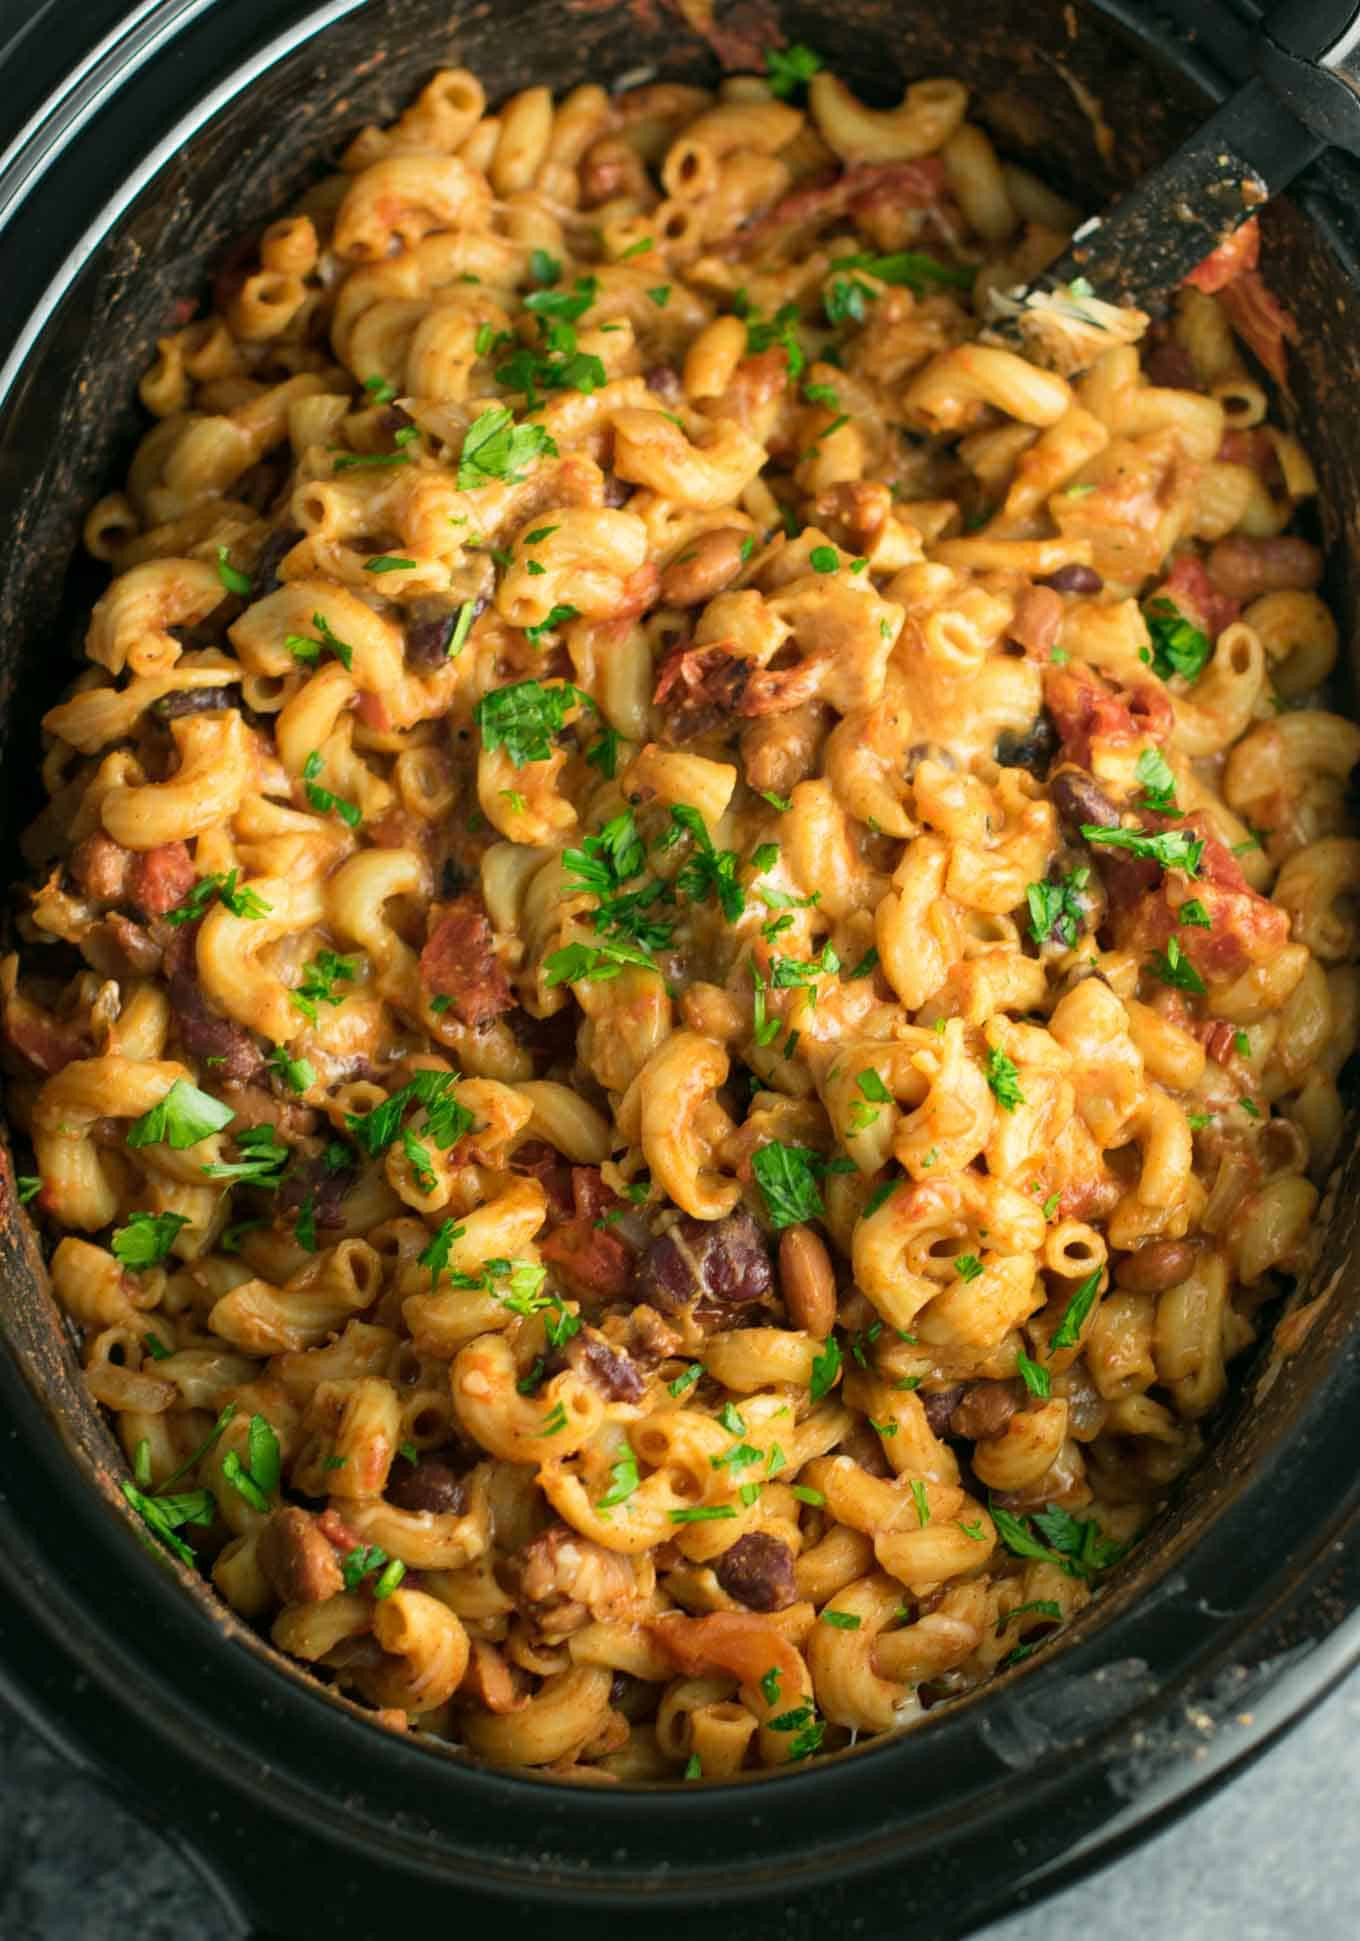 Easy Vegan Crockpot Recipes  Slow Cooker Ve arian Chili Mac Recipe Build Your Bite